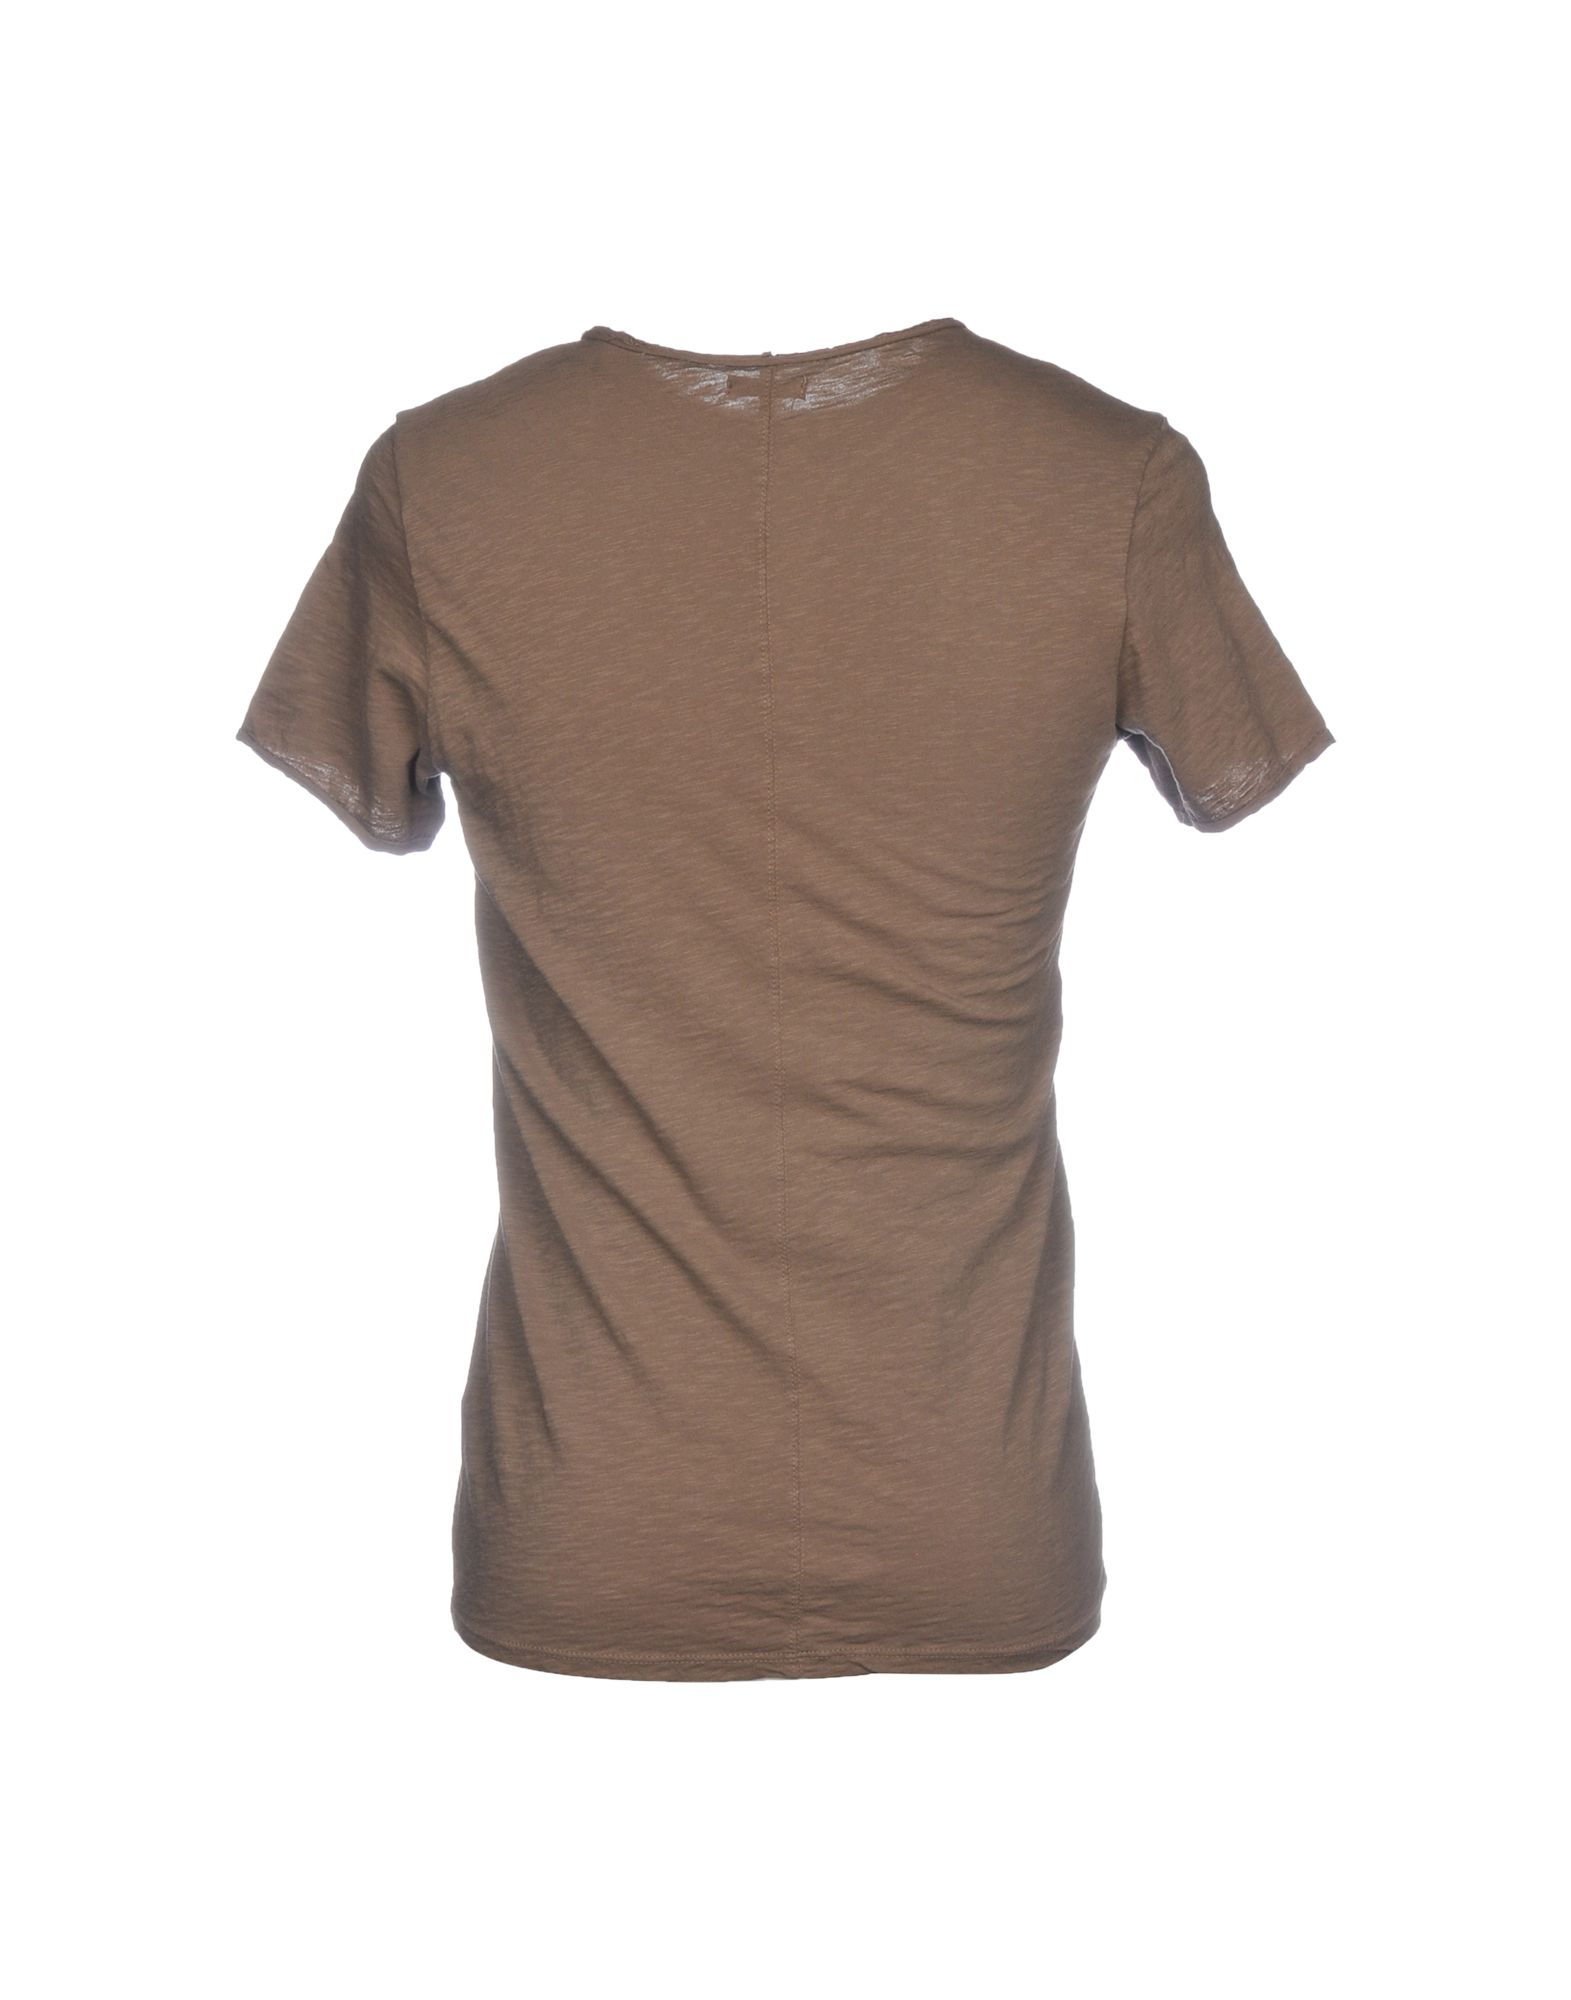 A buon mercato A buon 12032015LQ mercato T-Shirt Imperial Uomo - 12032015LQ buon 1beeaf